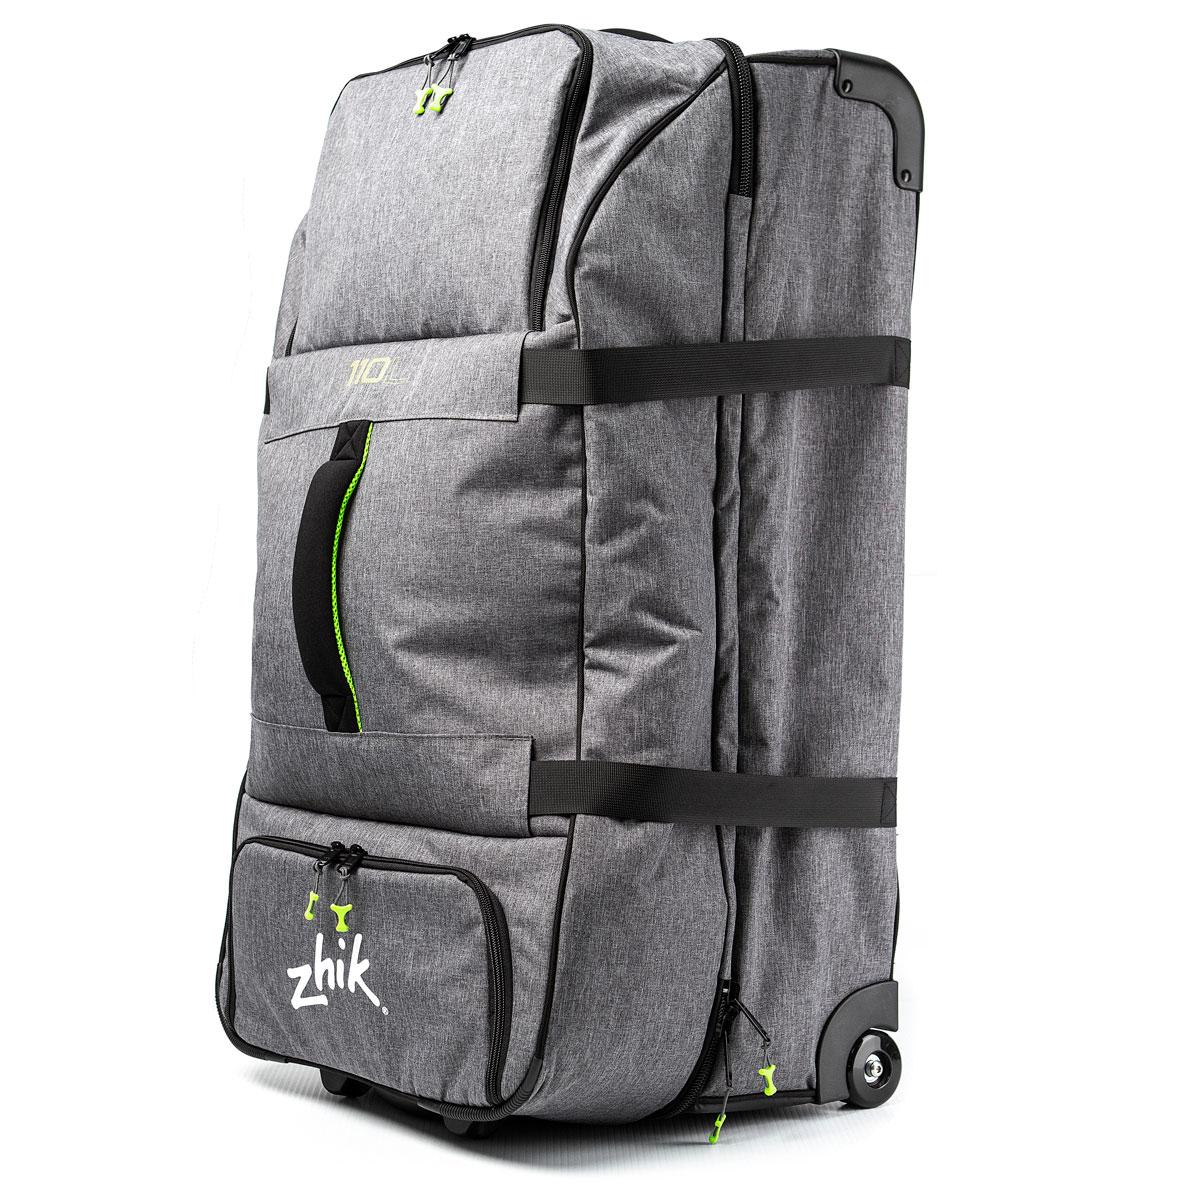 Zhik's new Wheelie Bag